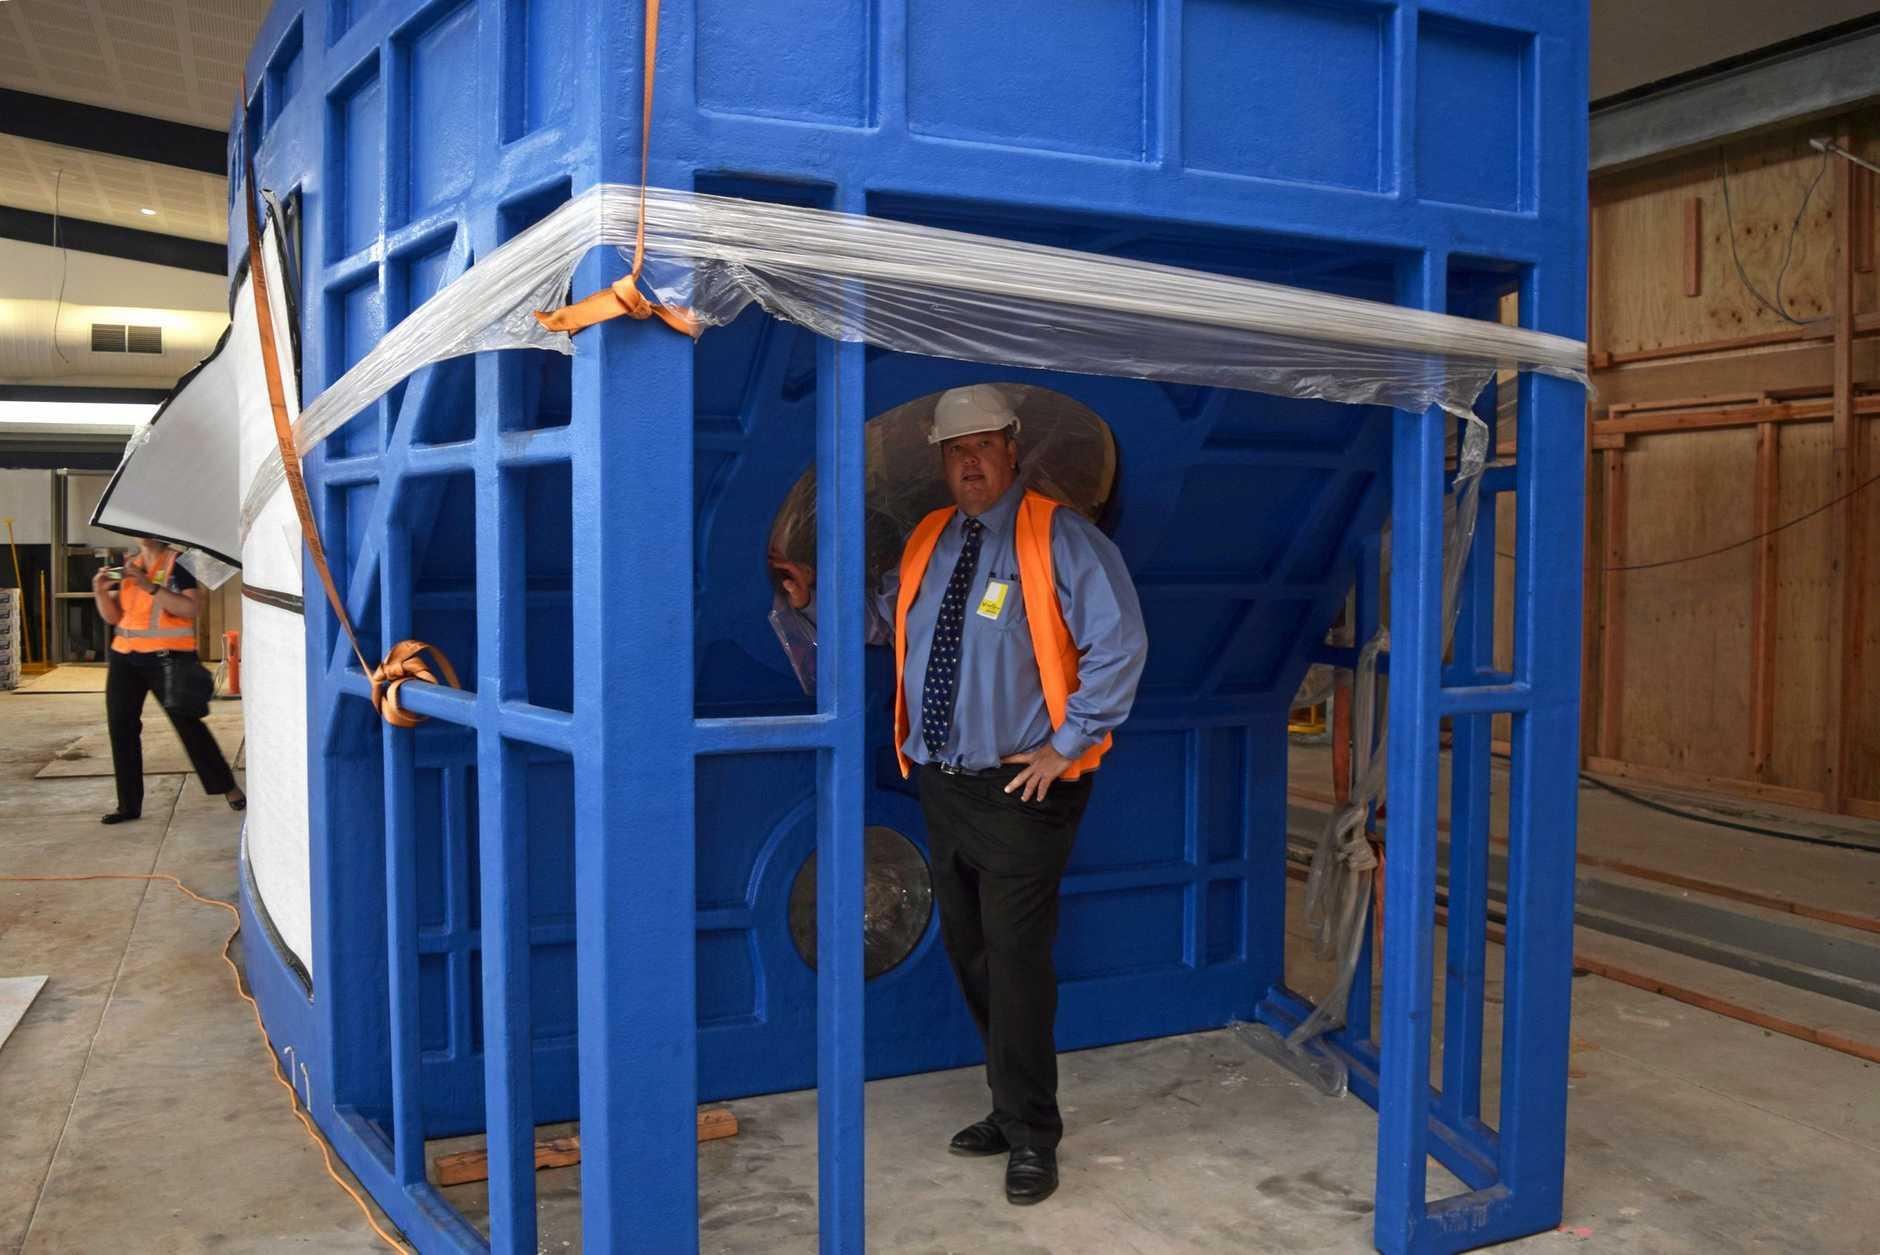 Mayor Andrew Willcox with the new aquarium at the Whitsunday Coast Airport.